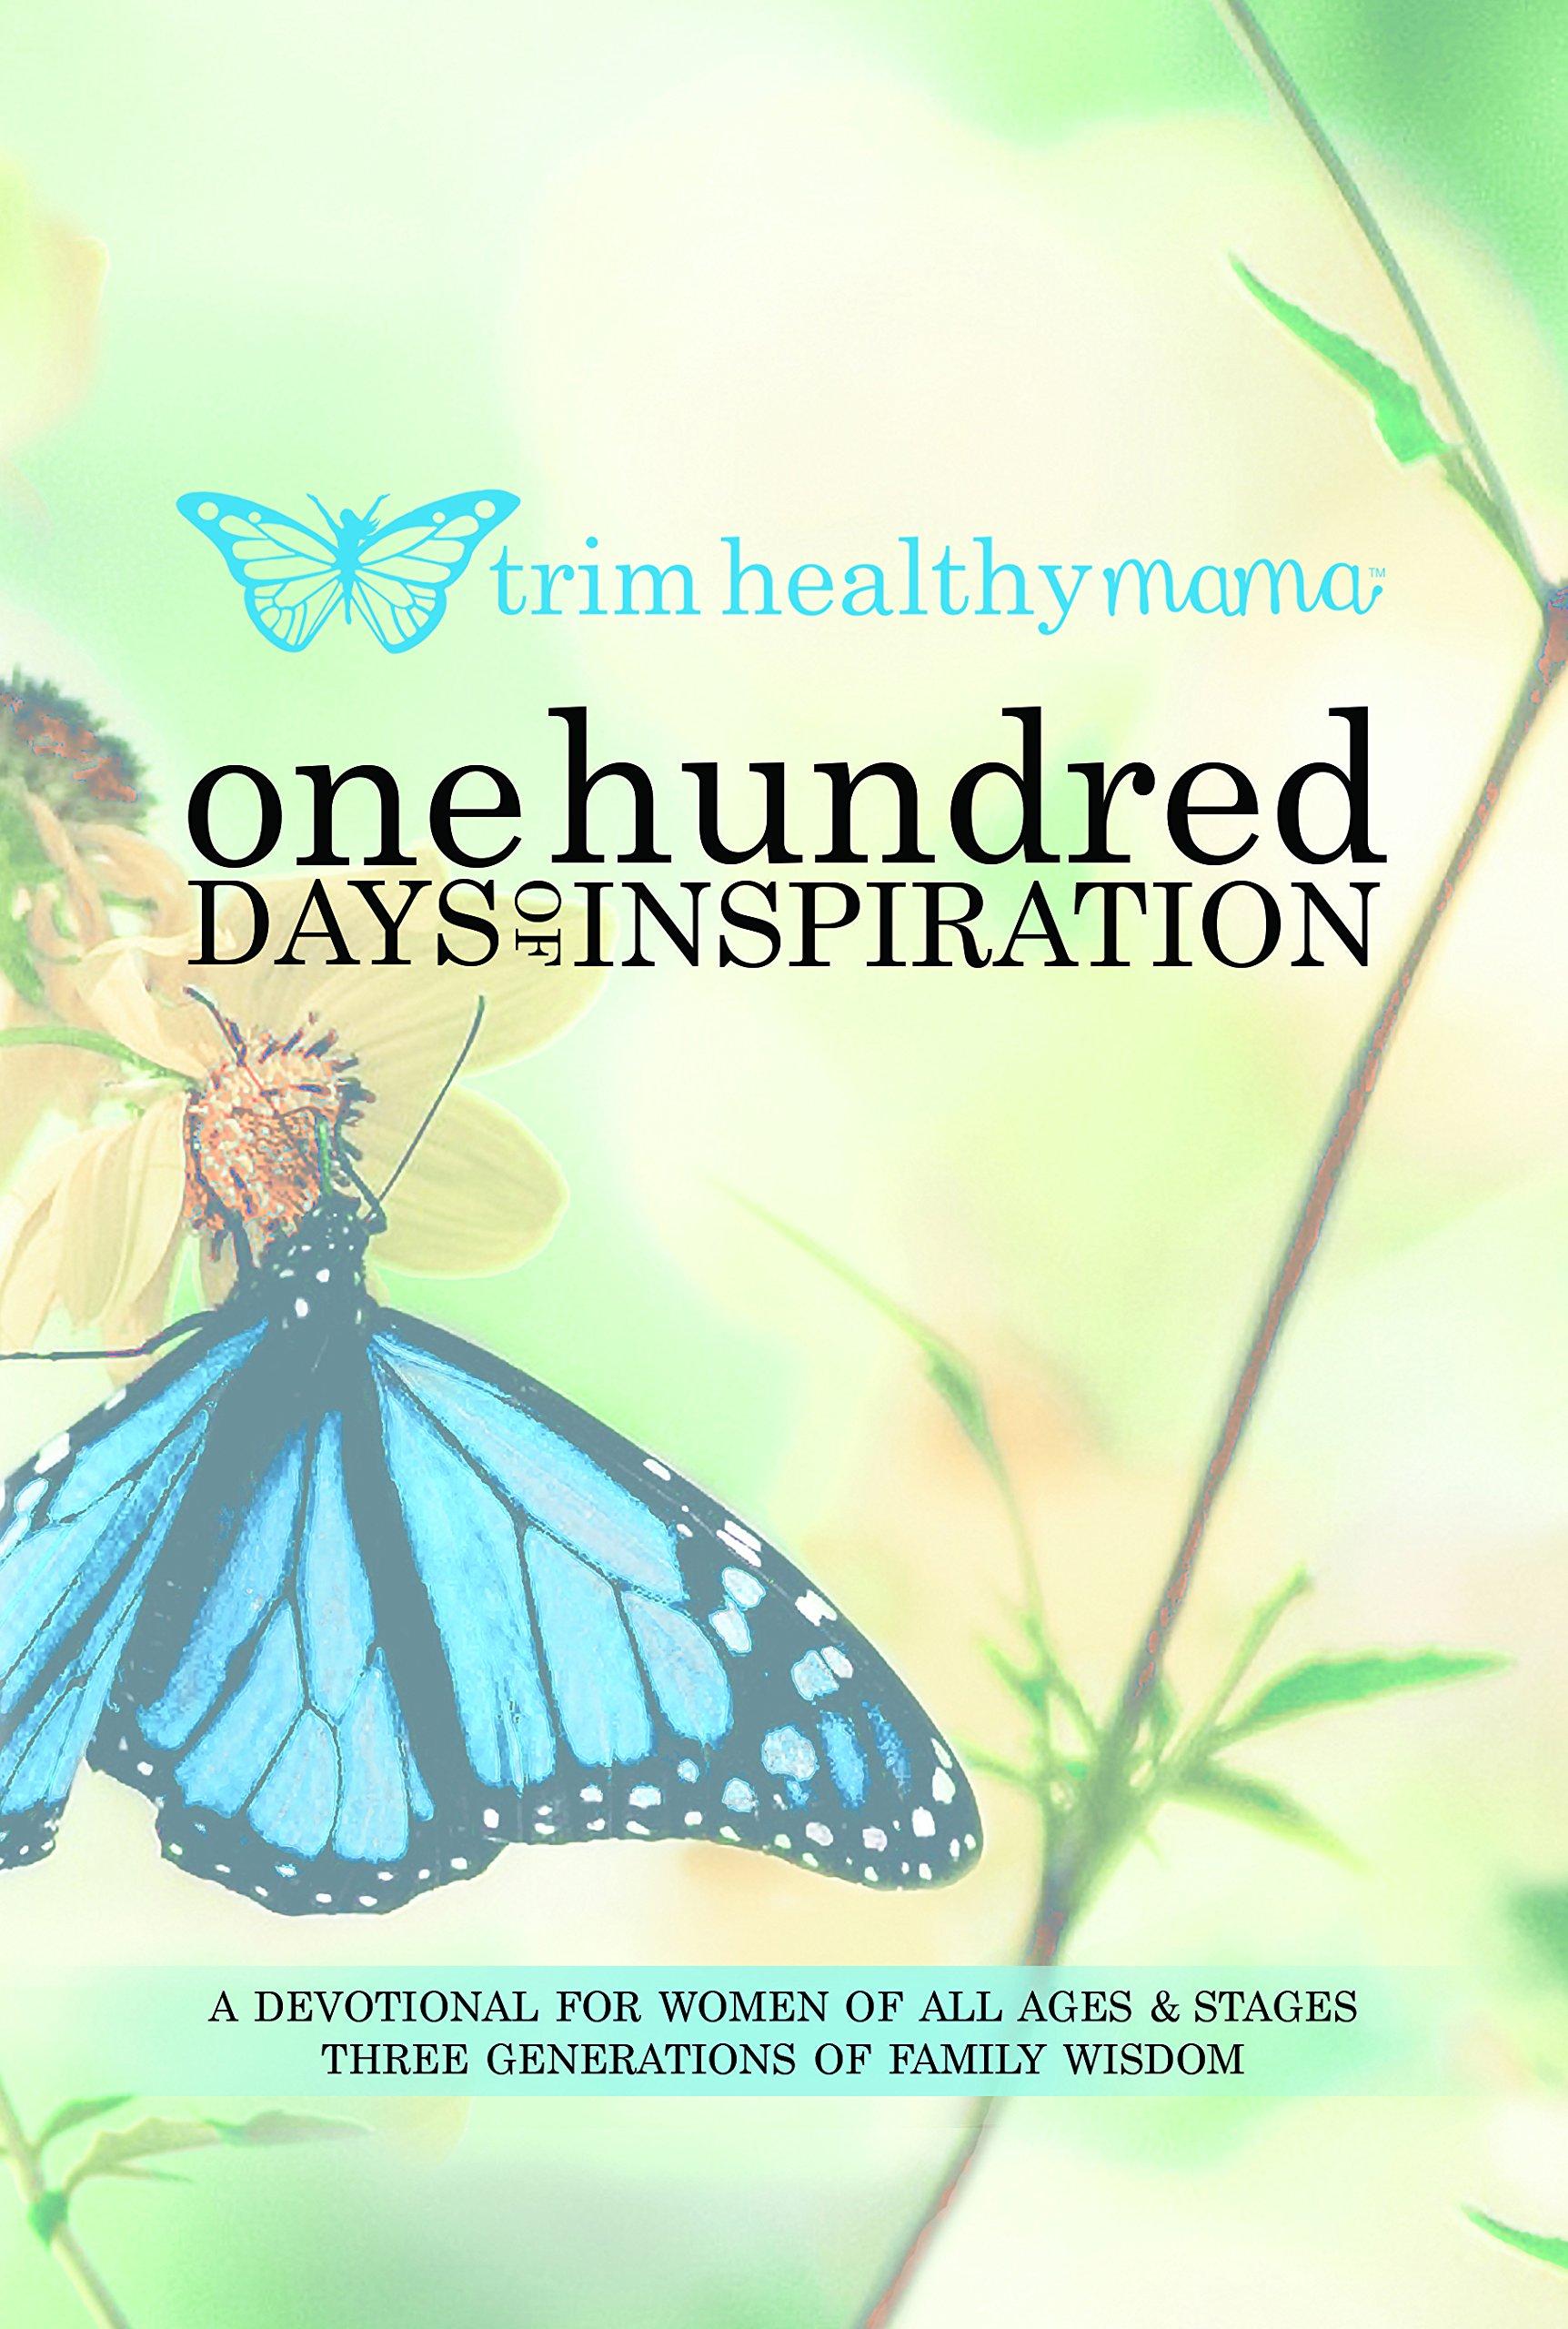 One Hundred Days Inspiration Devotional product image